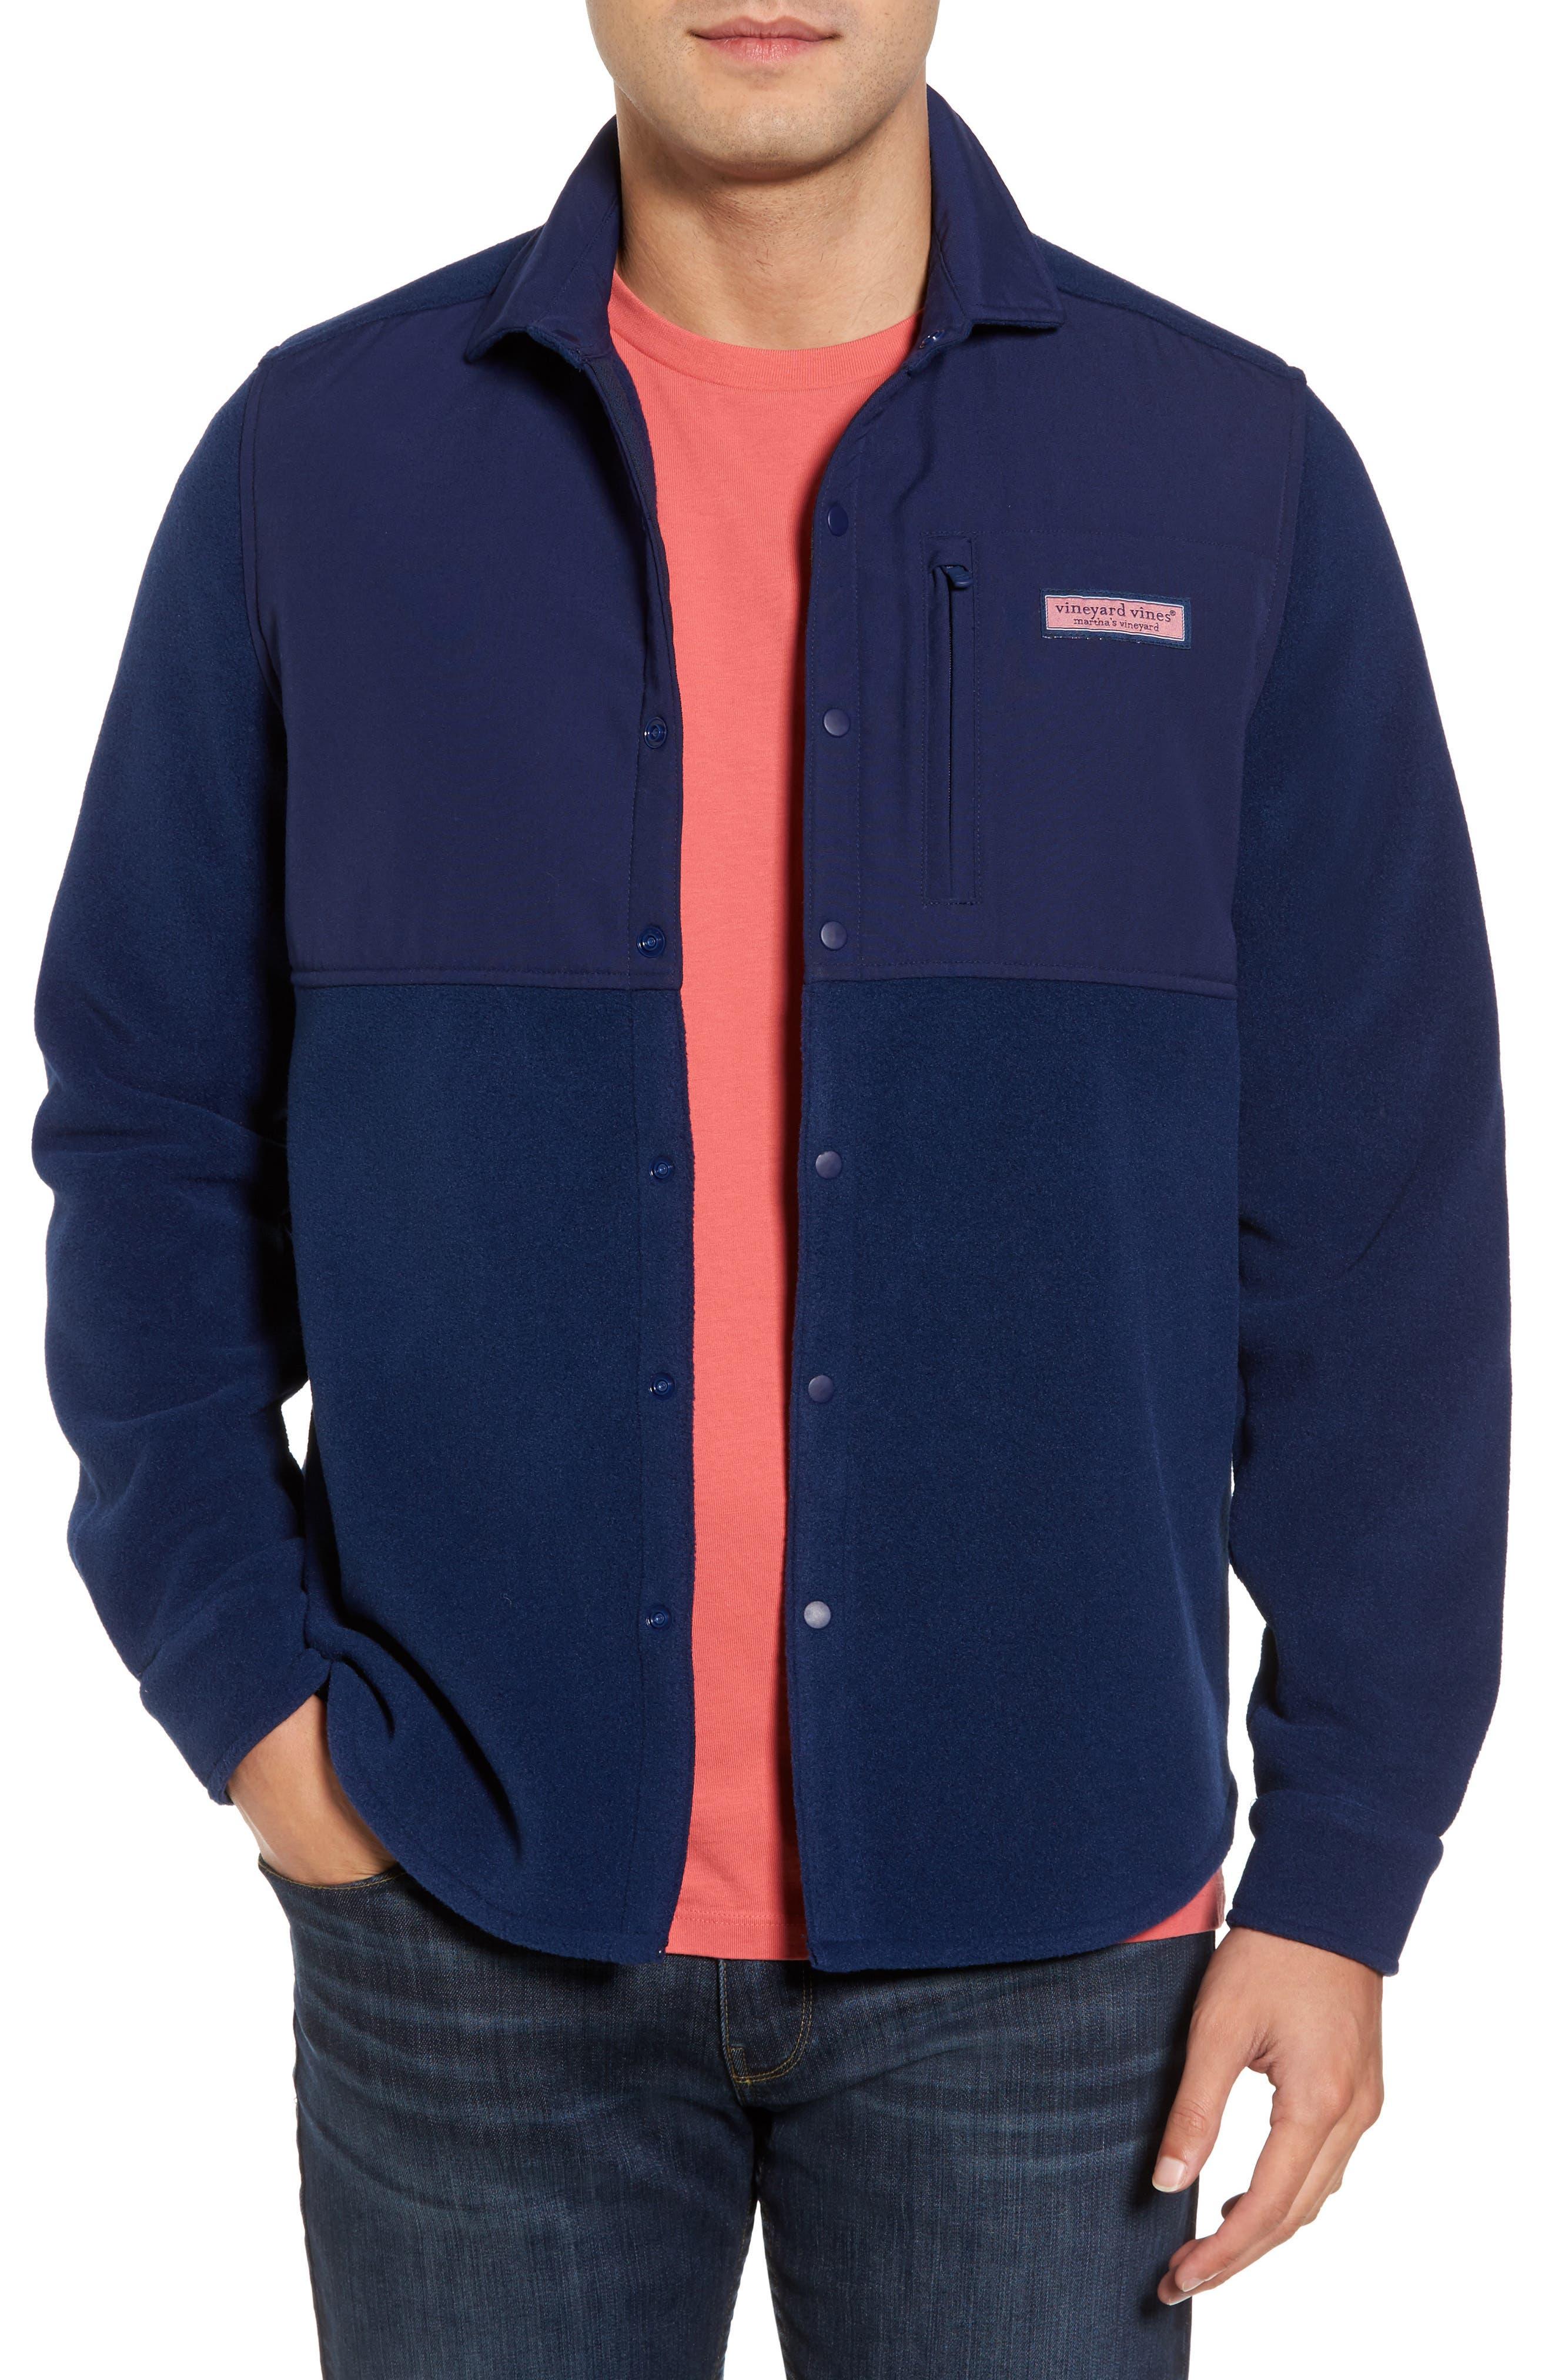 Alternate Image 1 Selected - vineyard vines Snap Front Fleece Jacket